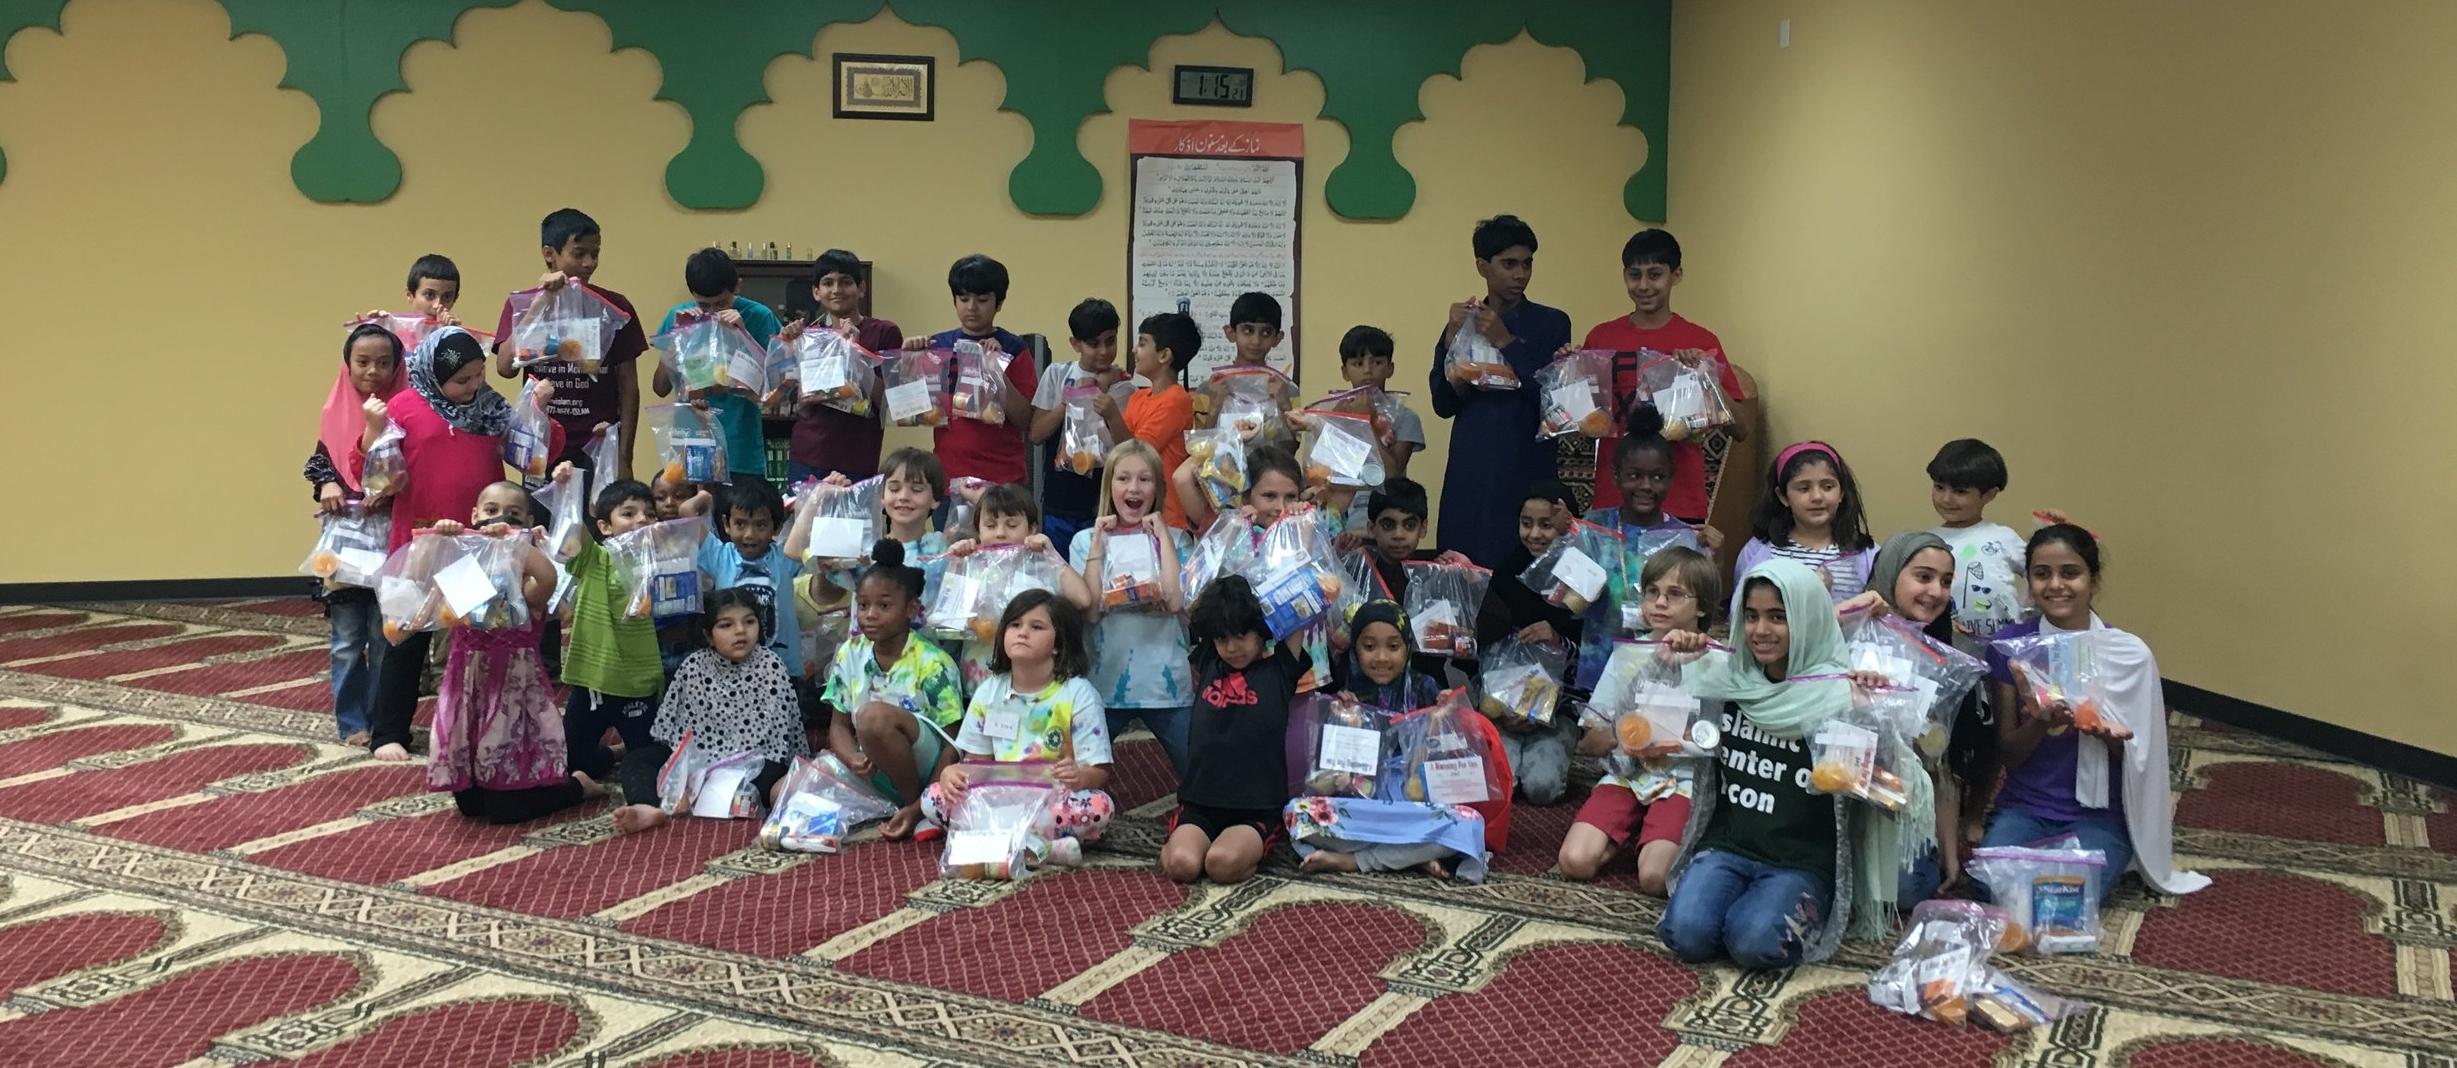 Kids at Islamic Center image1.jpeg